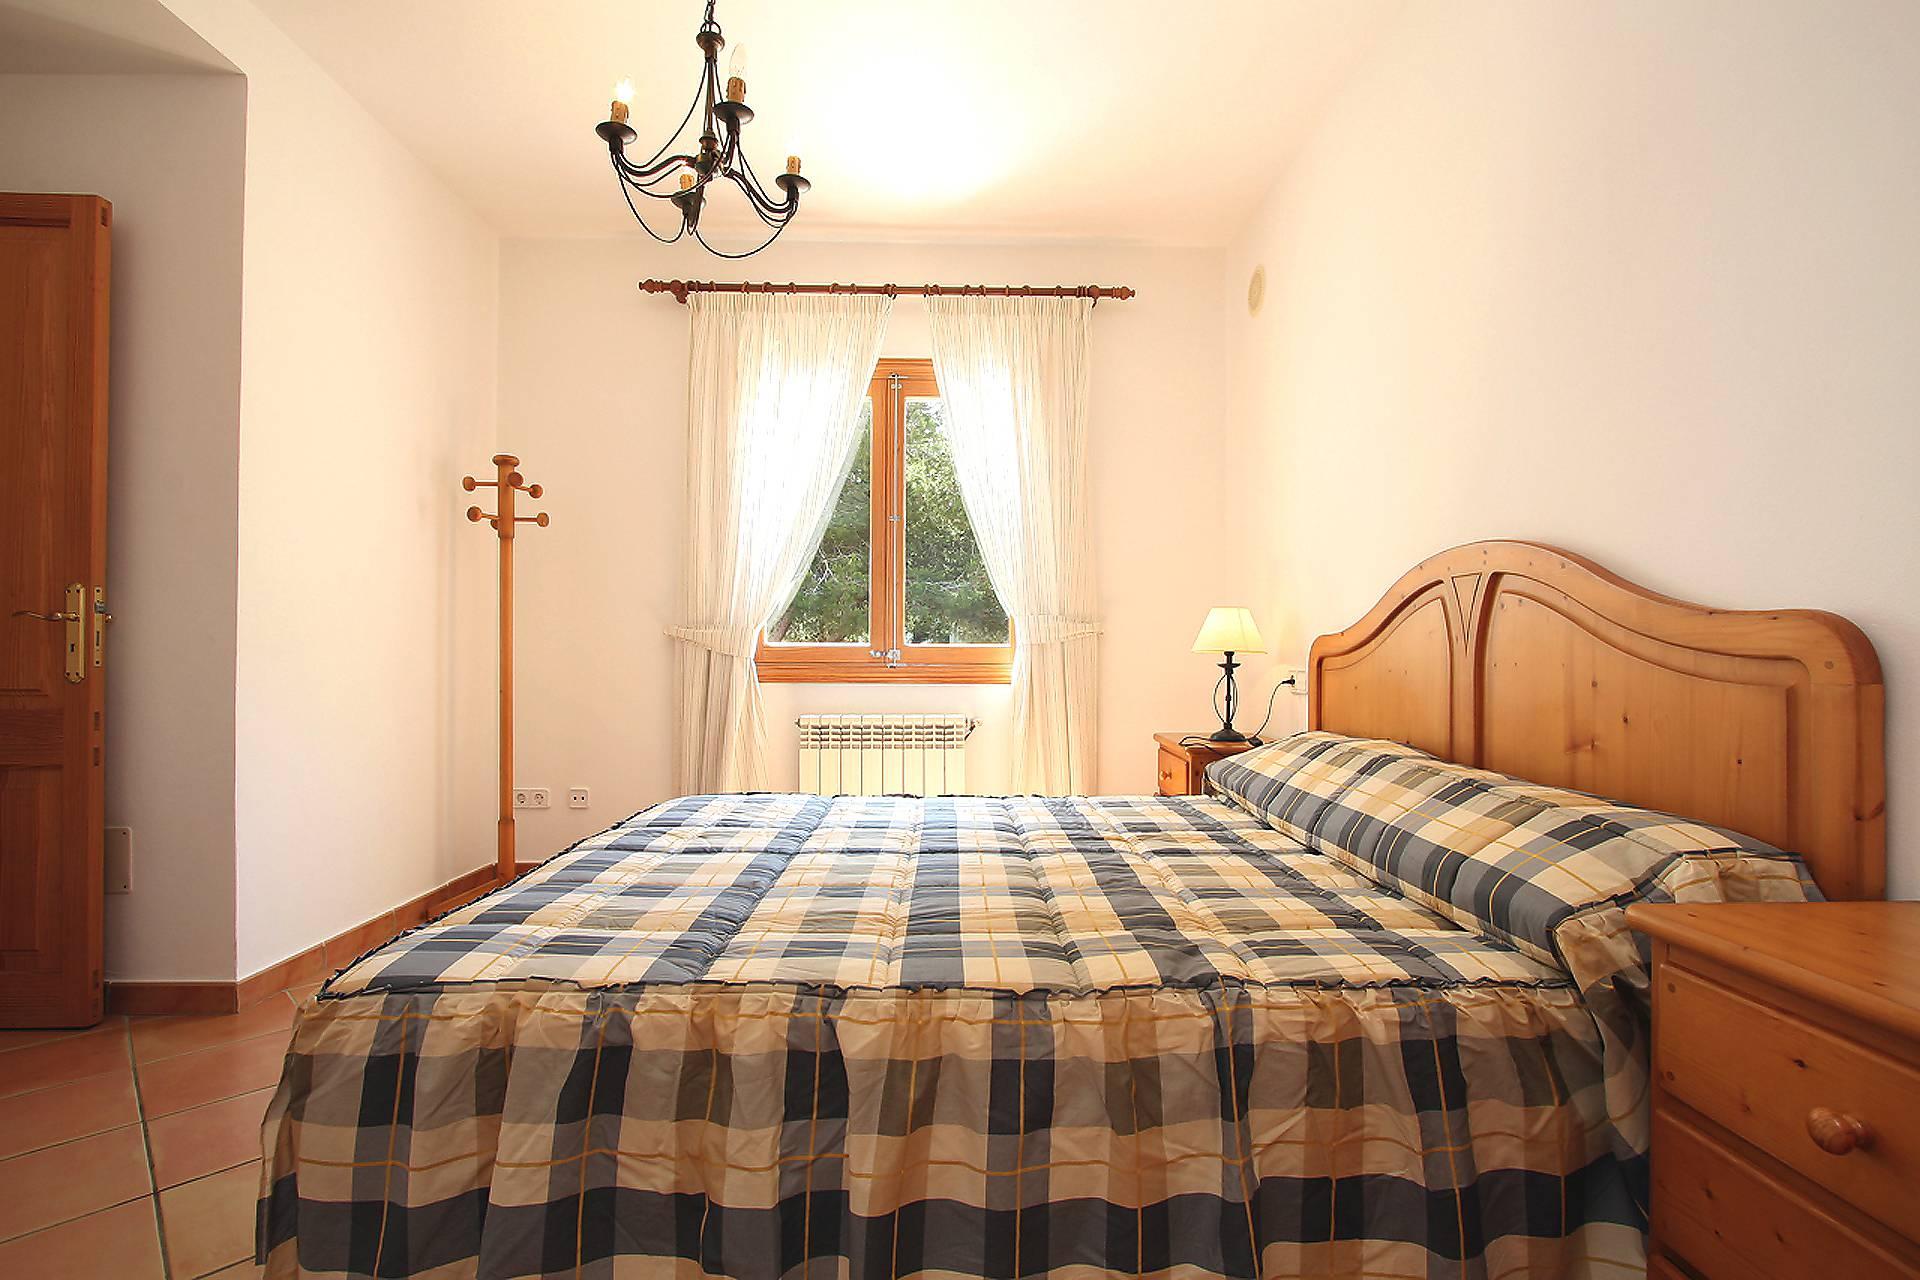 01-128 Rustic holiday home Majorca East Bild 17